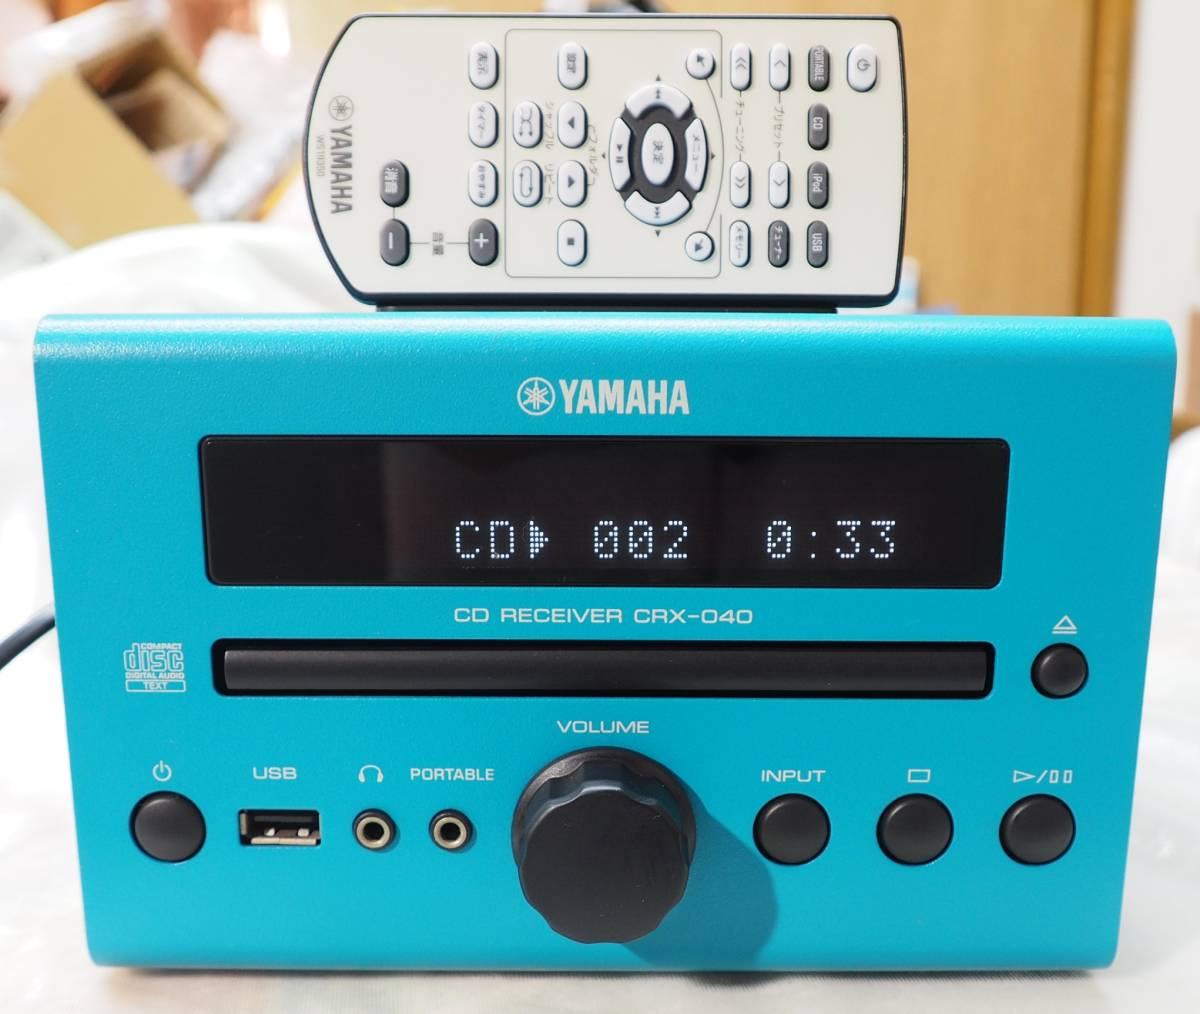 YAMAHA CRX-040 CDレシーバーアンプ【ピックアップ新品・リモコン付属・動作品】_画像1